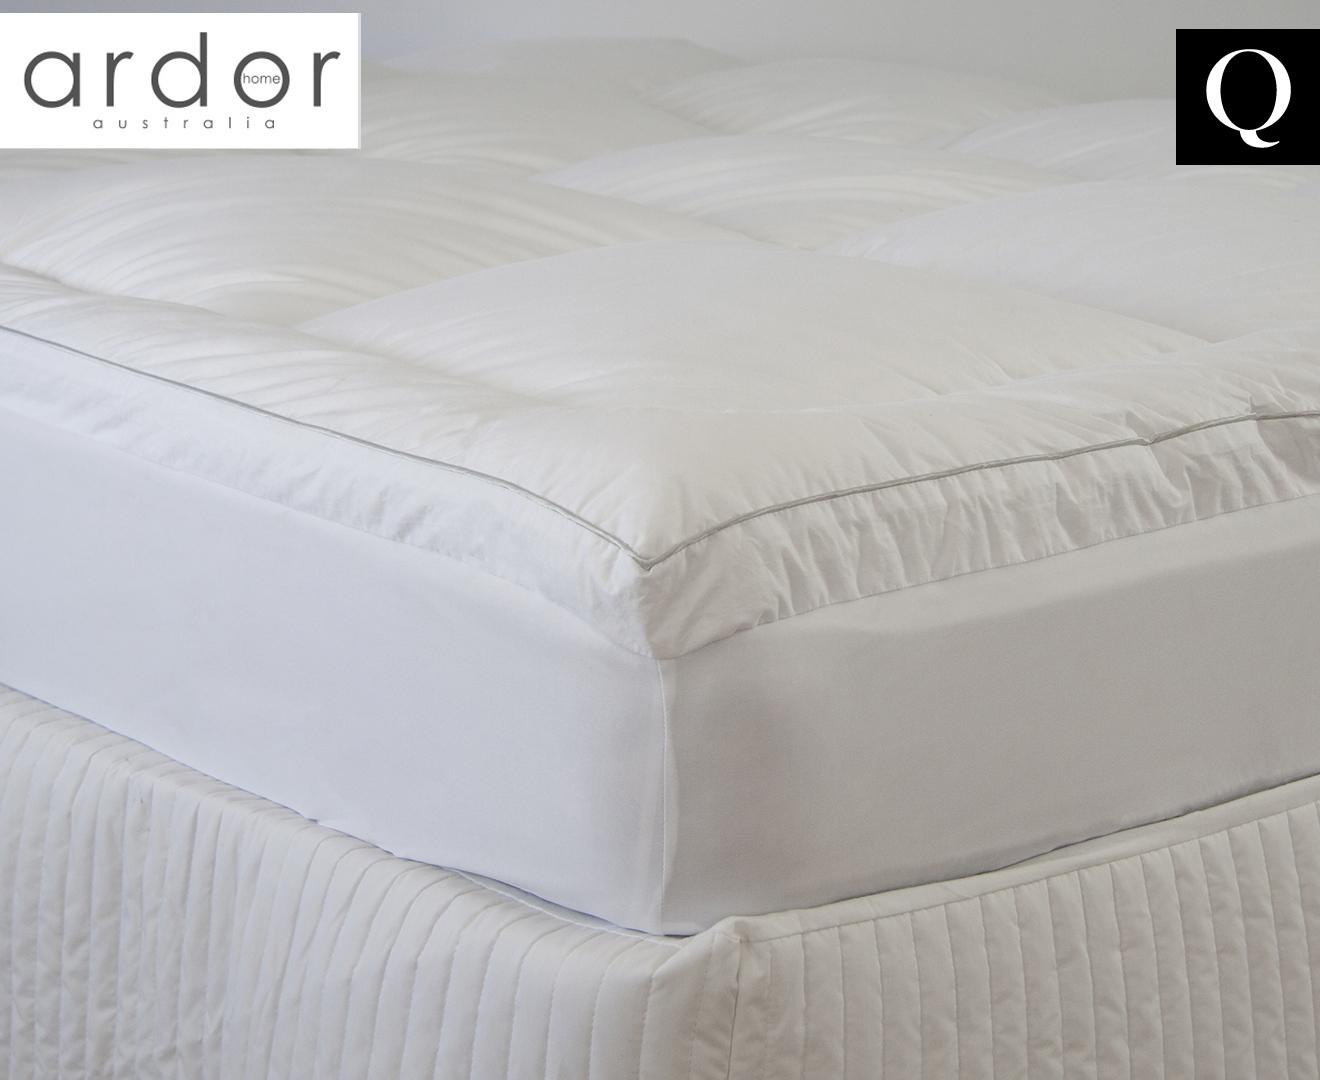 Ardor 2000gsm Microfibre High Loft Mattress Topper SINGLE//DOUBLE//QUEEN//KING NEW